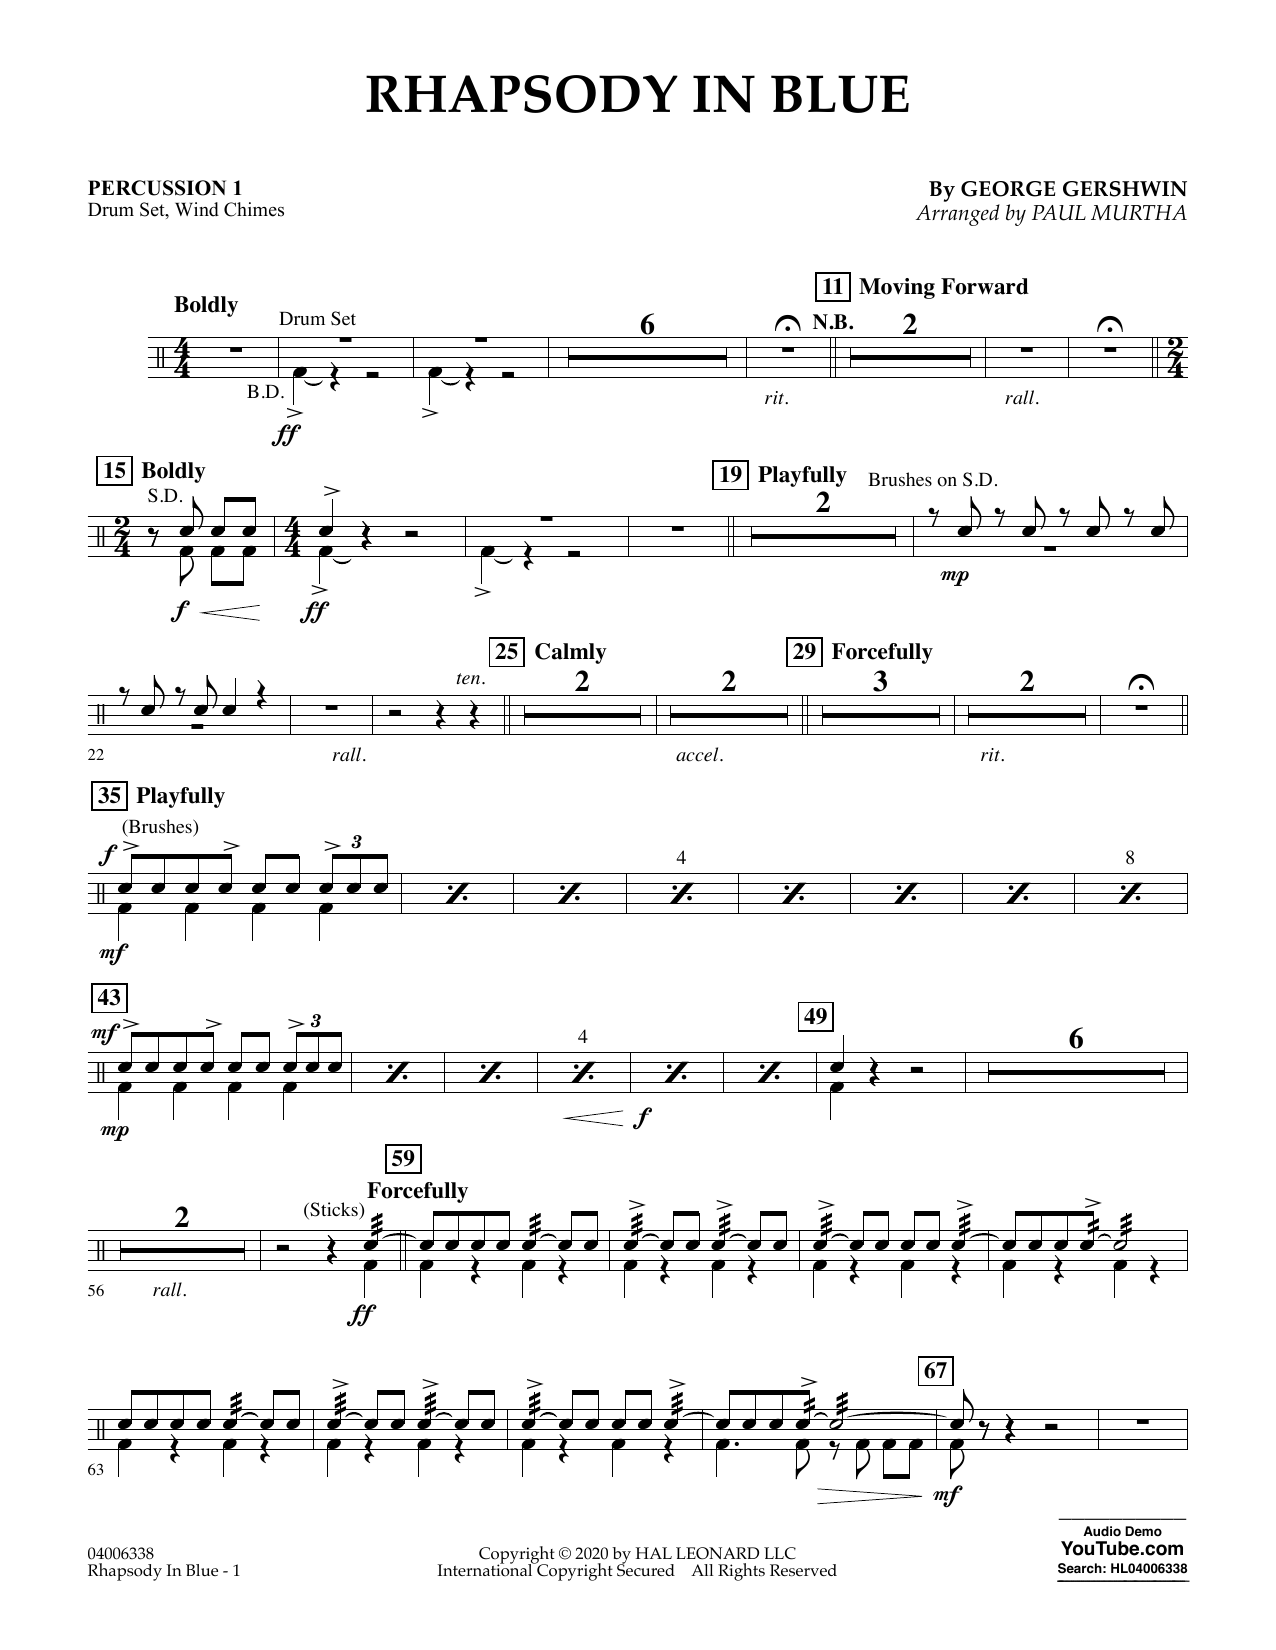 Rhapsody in Blue (arr. Paul Murtha) - Percussion 1 (Concert Band: Flex-Band)